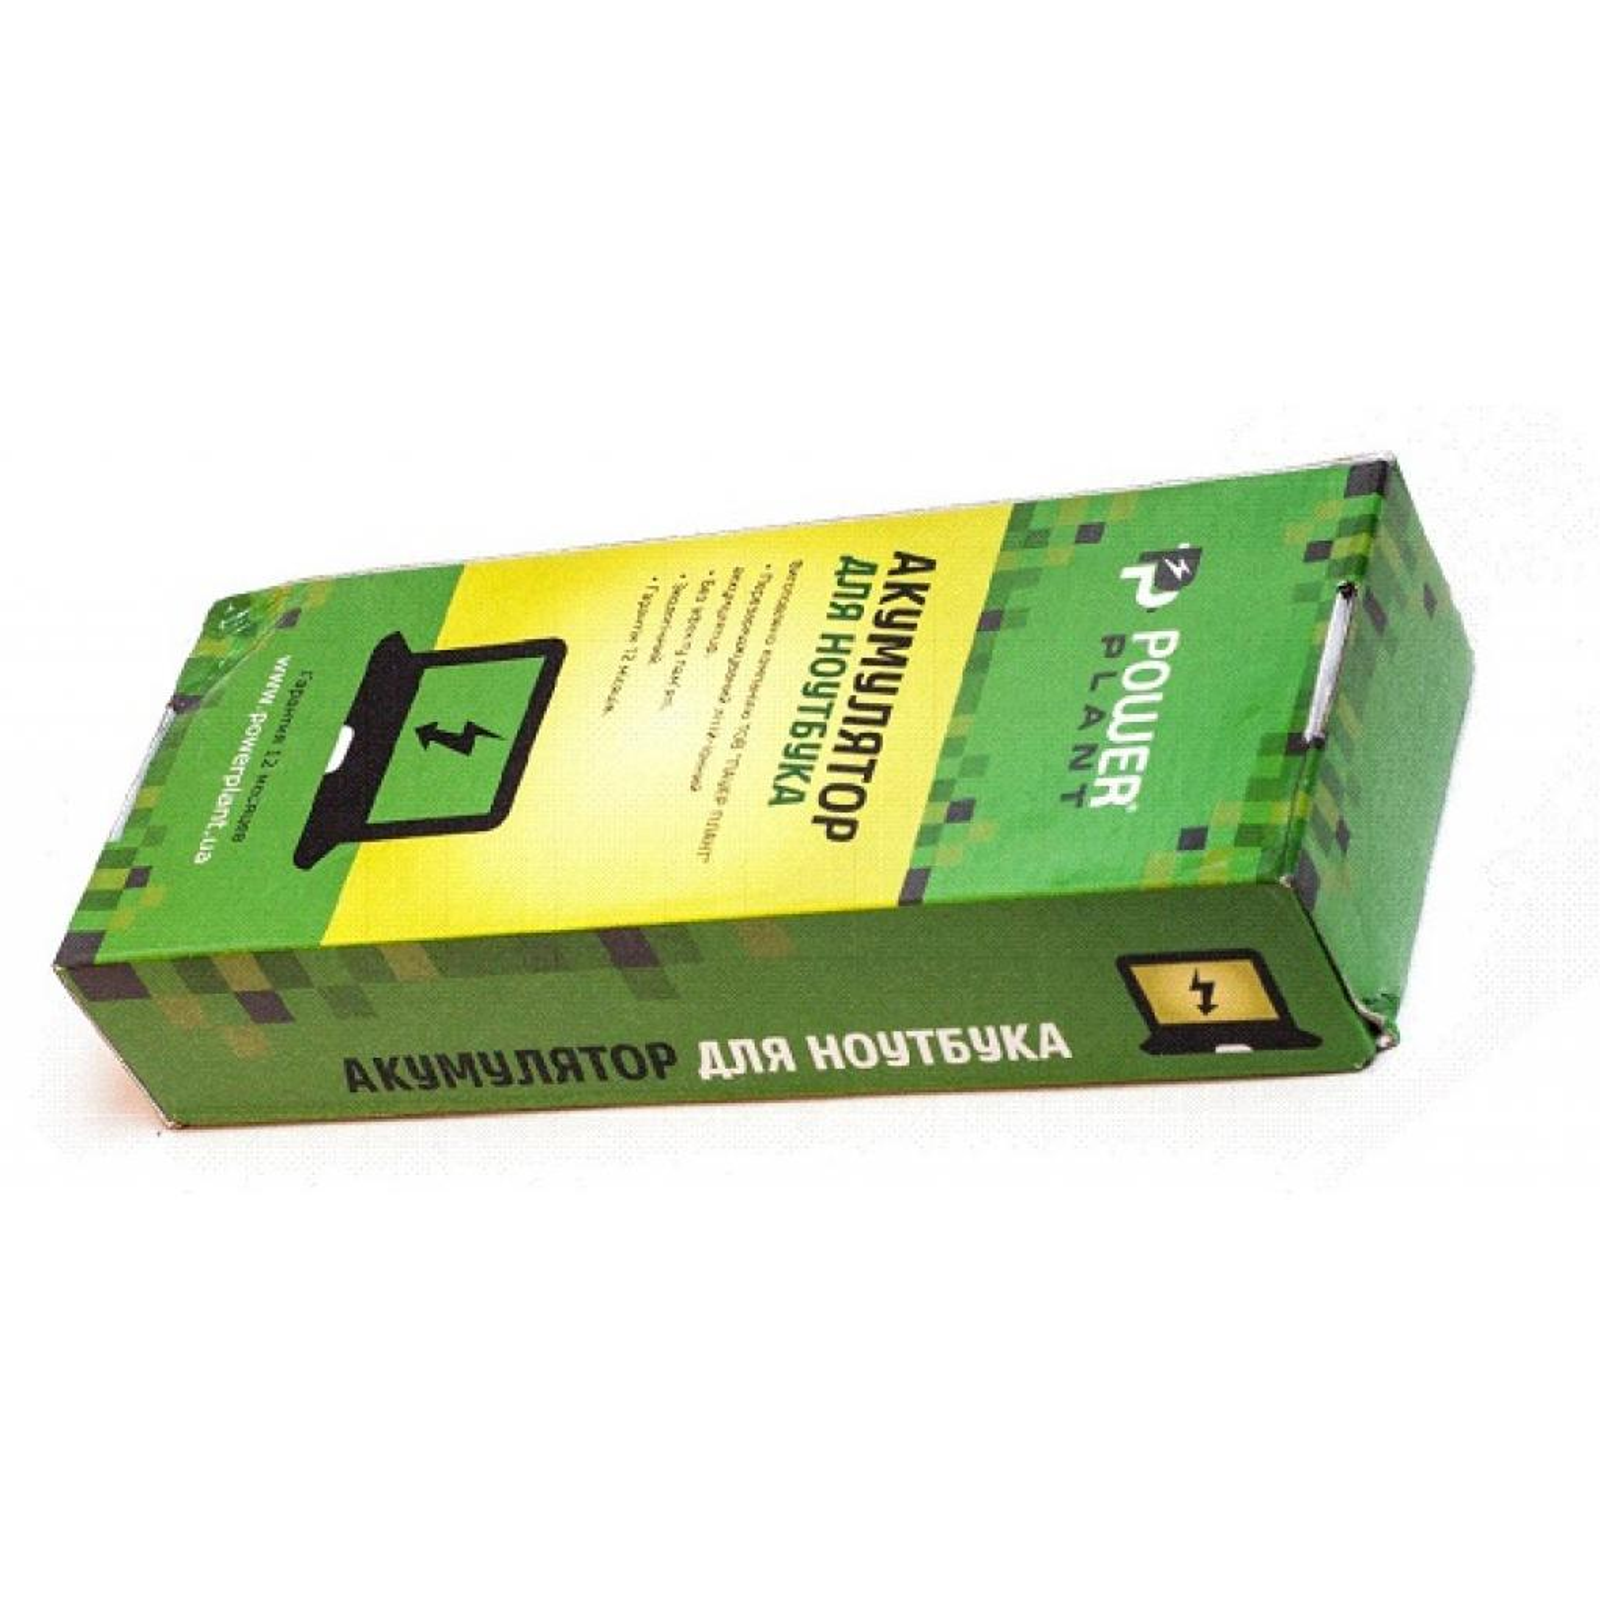 Аккумулятор для ноутбука ACER Aspire 5230 (AS07B41, AR5923LH) 11.1V 4400mAh PowerPlant (NB00000195) изображение 3